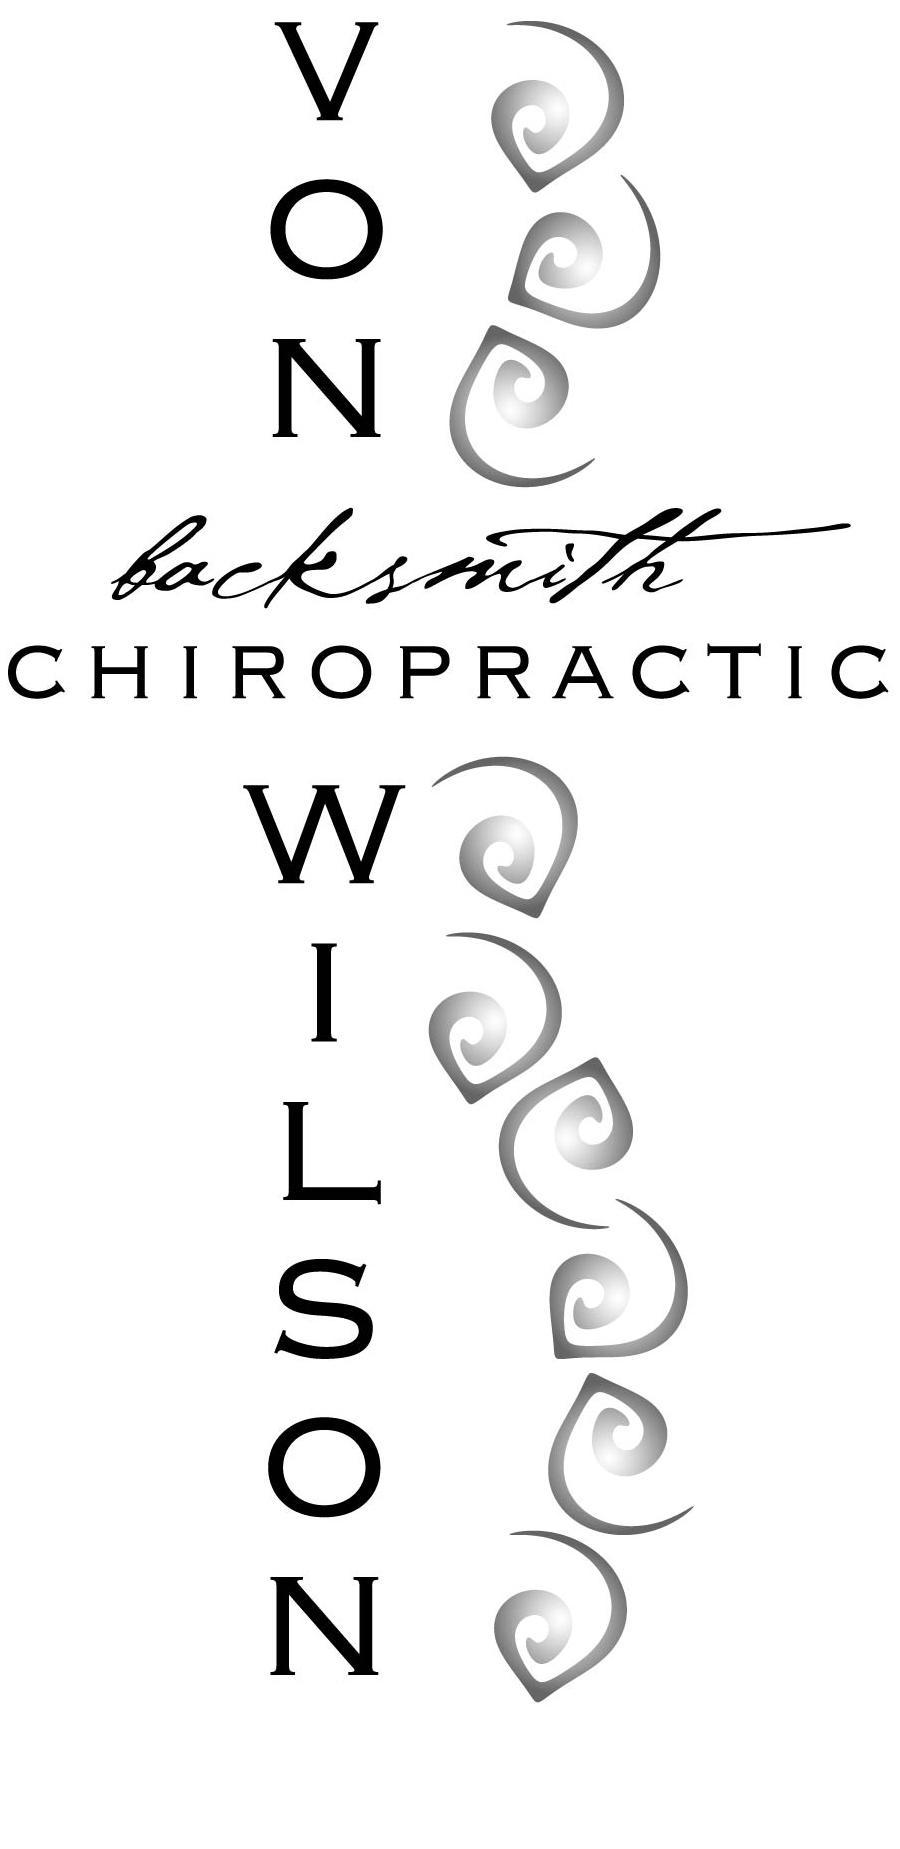 BackSmith Chiropractic